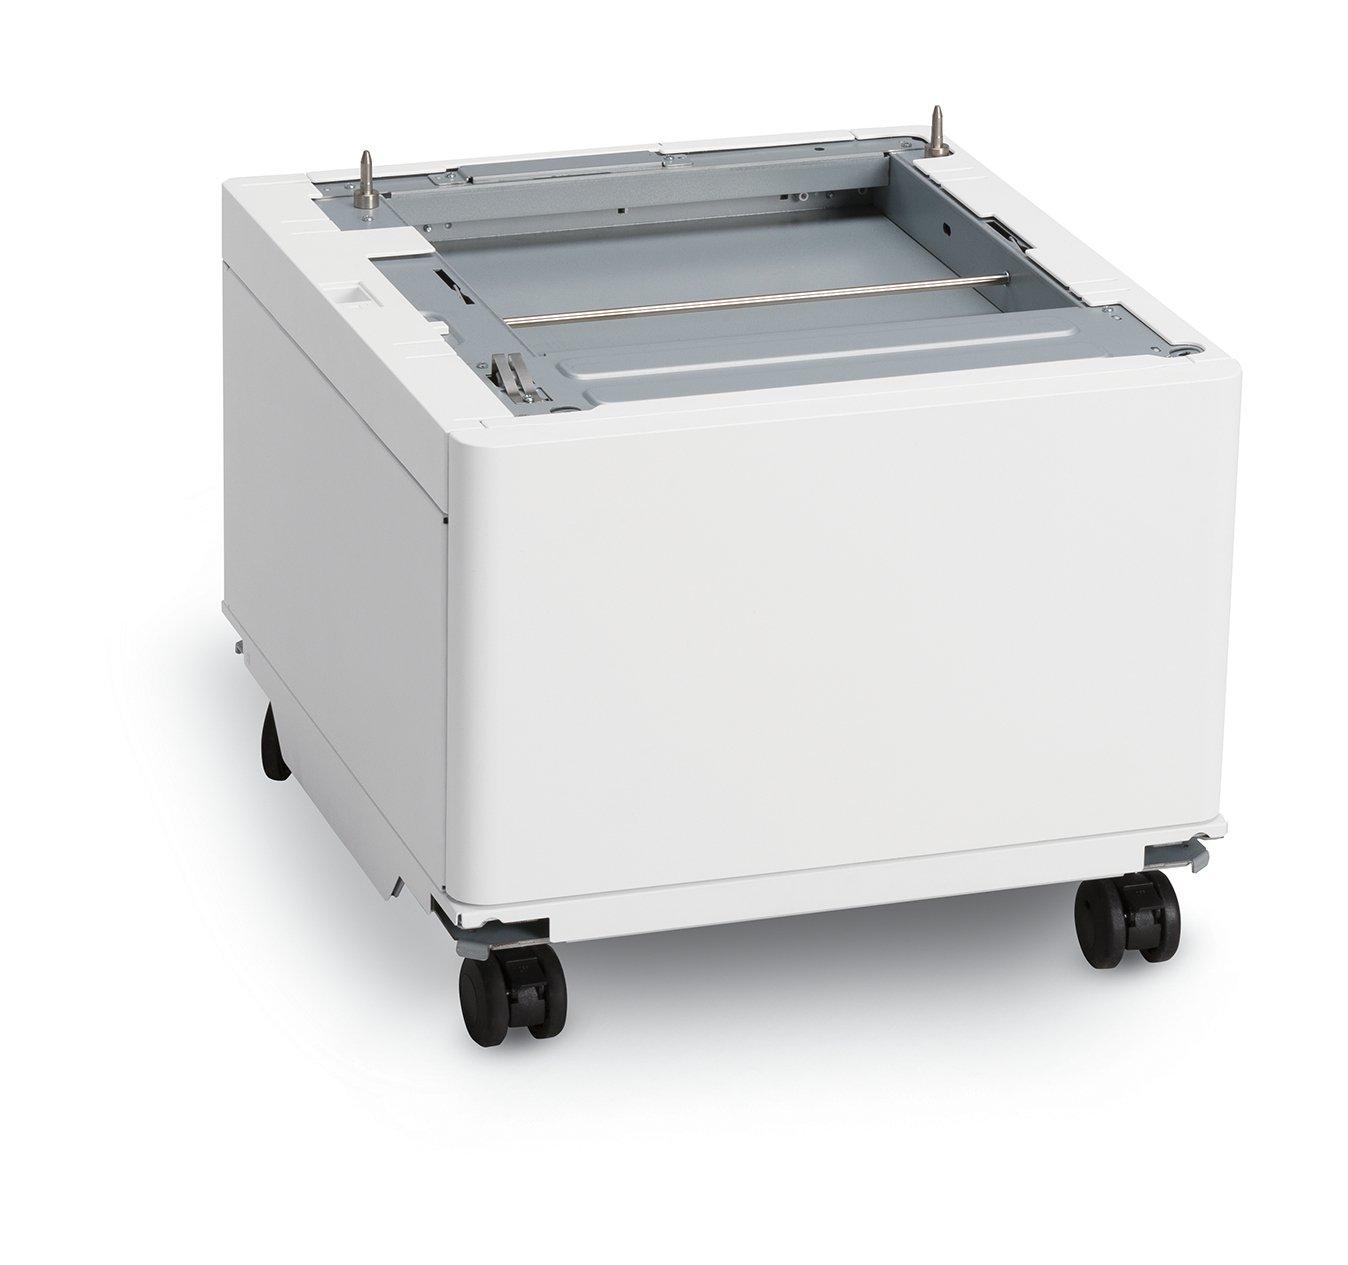 Xerox 097S04955 MFP stand - for VersaLink B600, B605, B610, B615, C500, C505, C600, C605